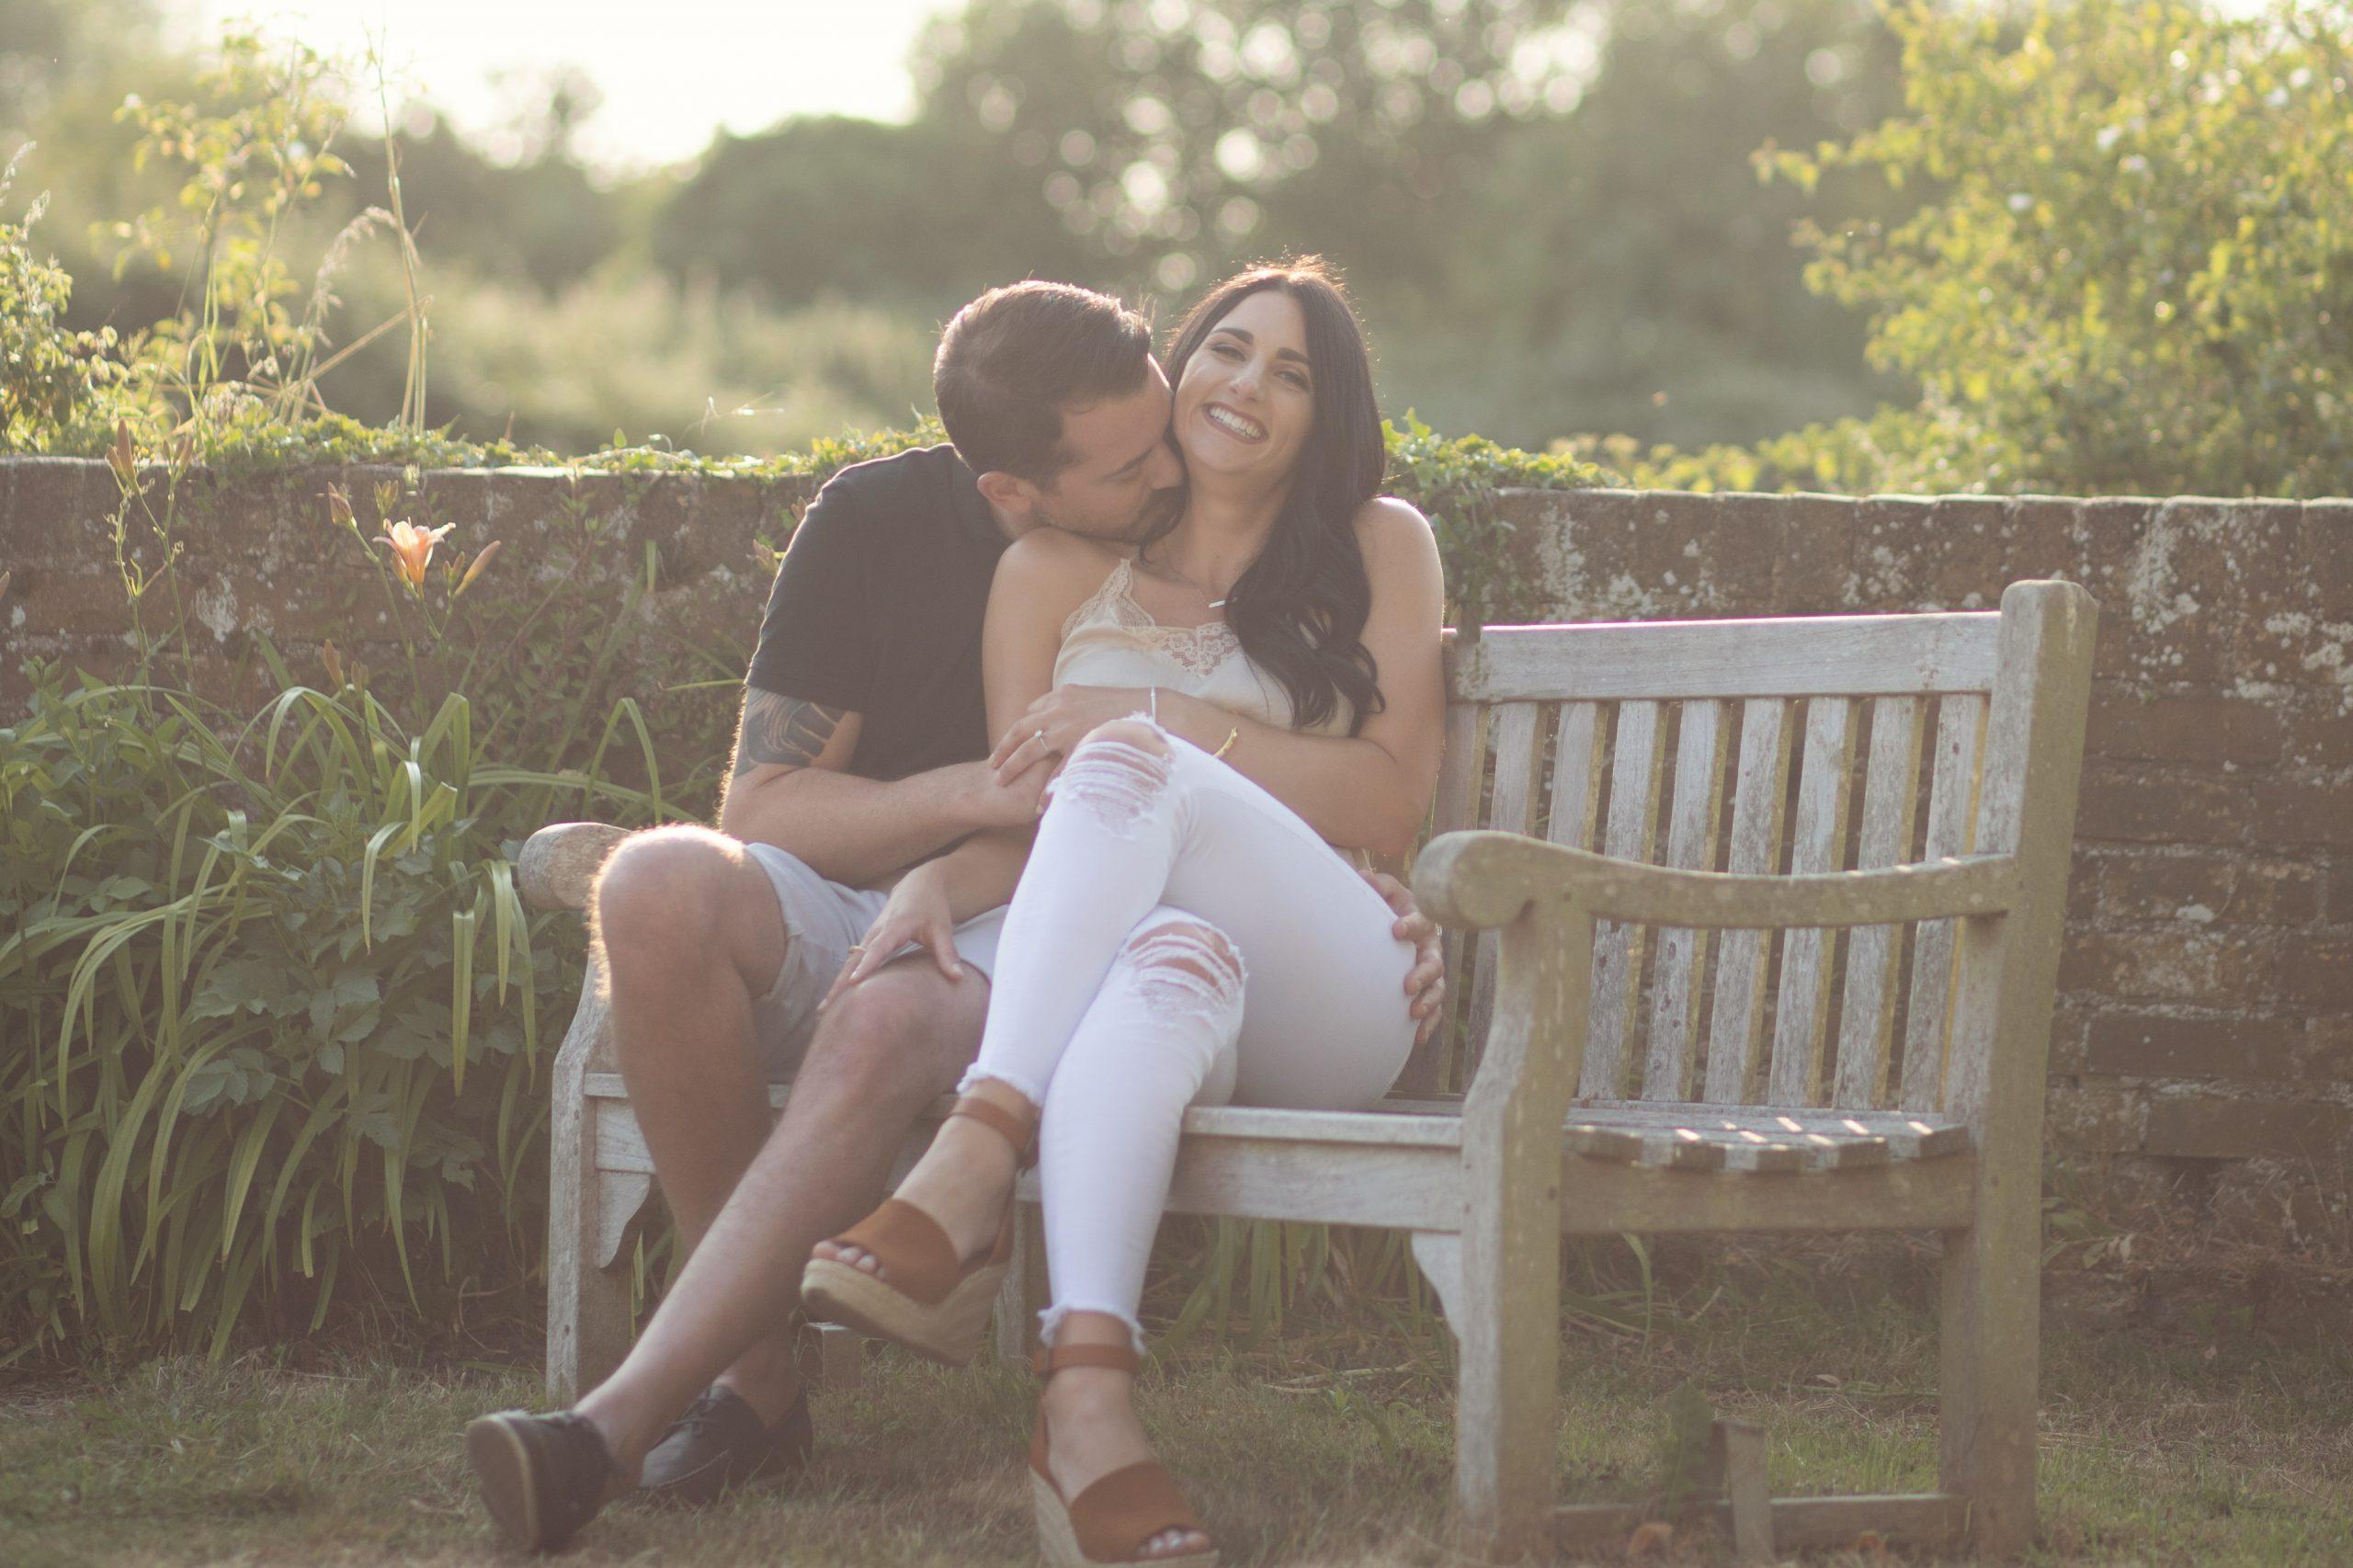 pre wedding photoshoot kent photographer kerry ann duffy